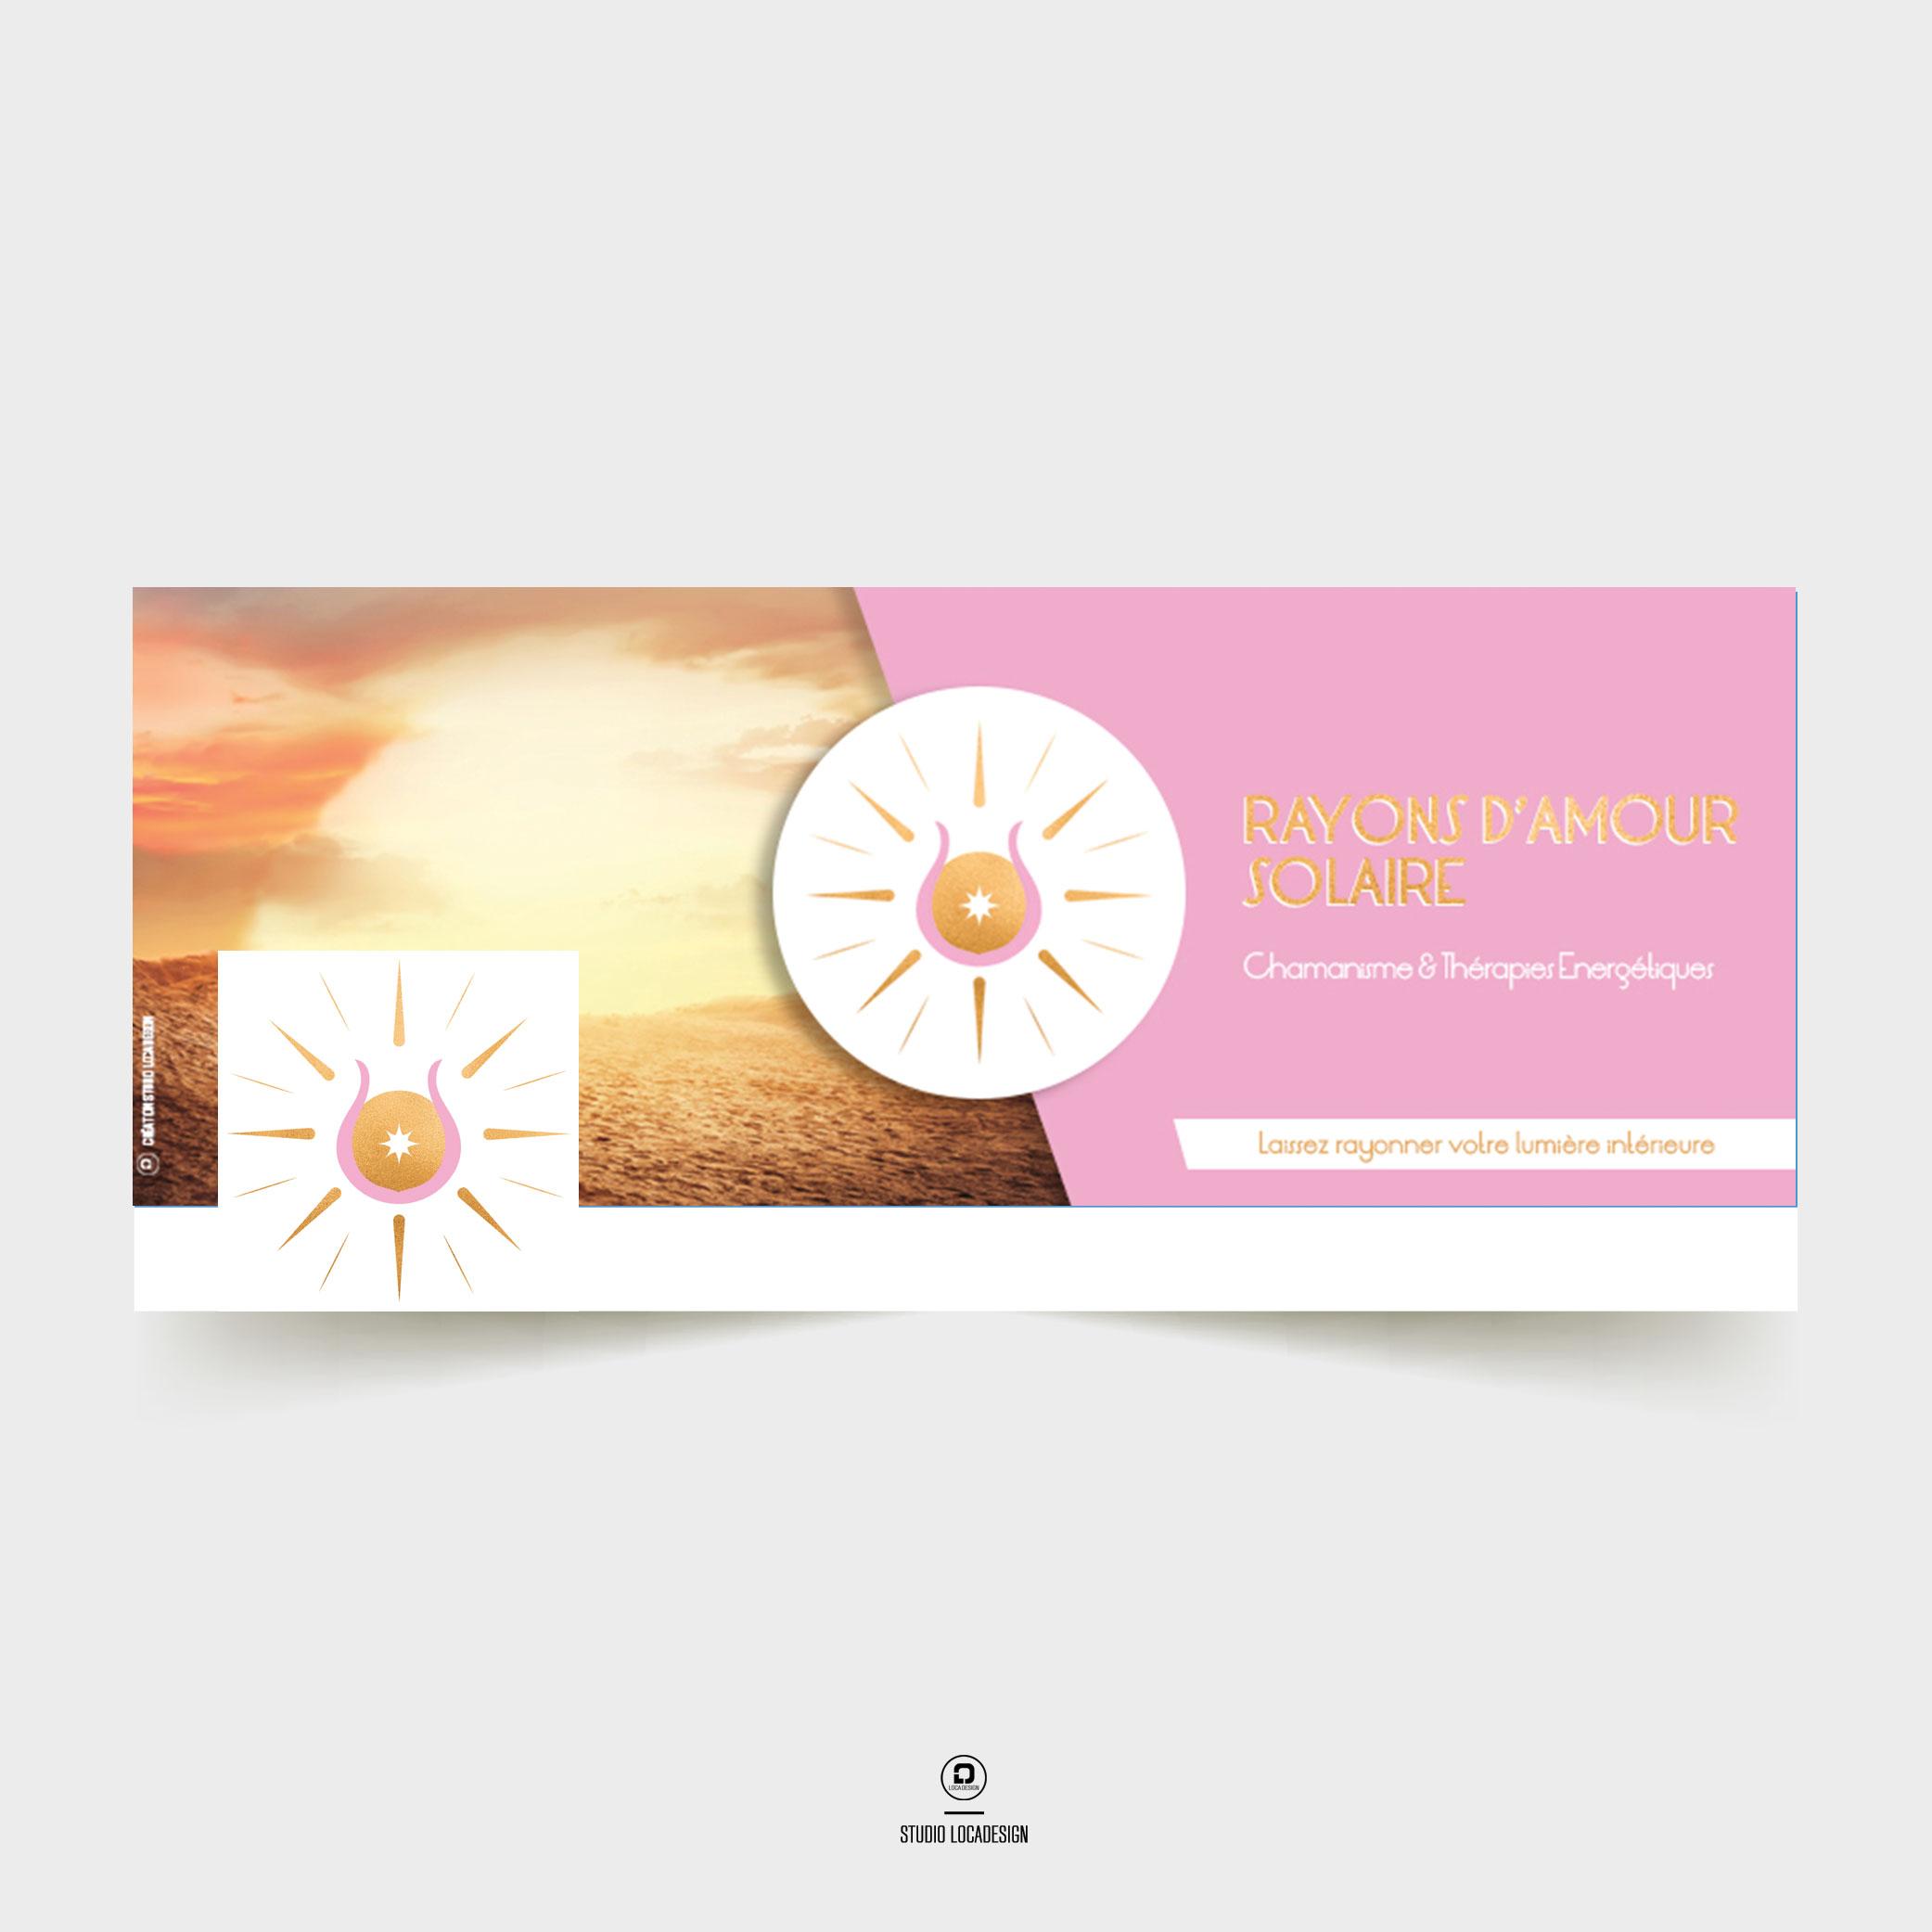 Bannière web Facebook Rayons d'amour solaires Création Studio Locadesign 83